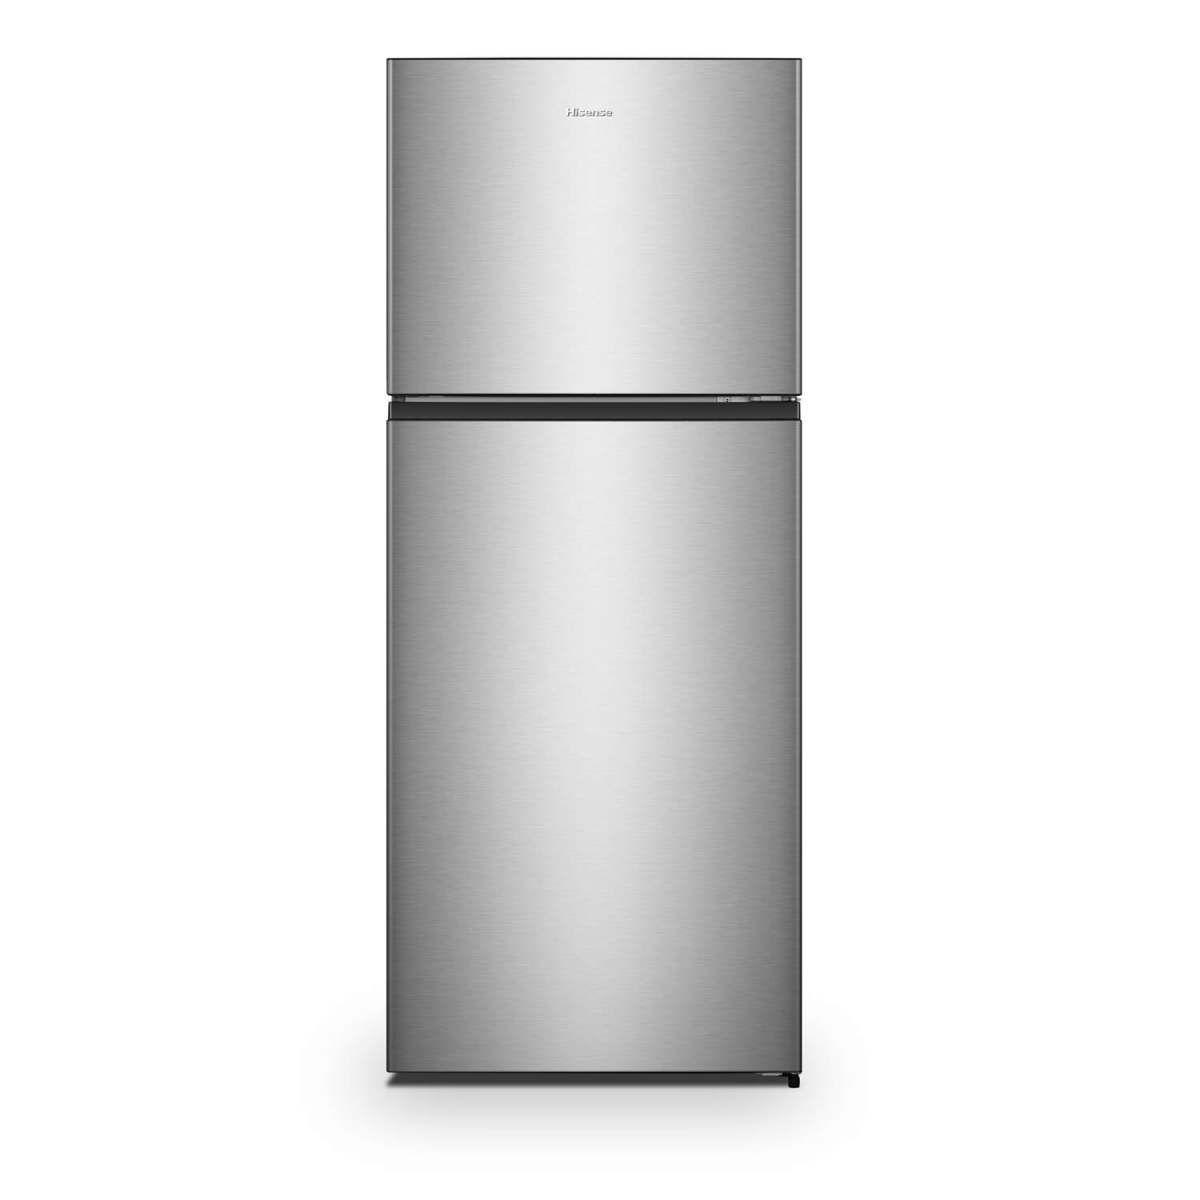 Hisense 411 L 2 Star Double Door Refrigerator (RT488N4ASB2)